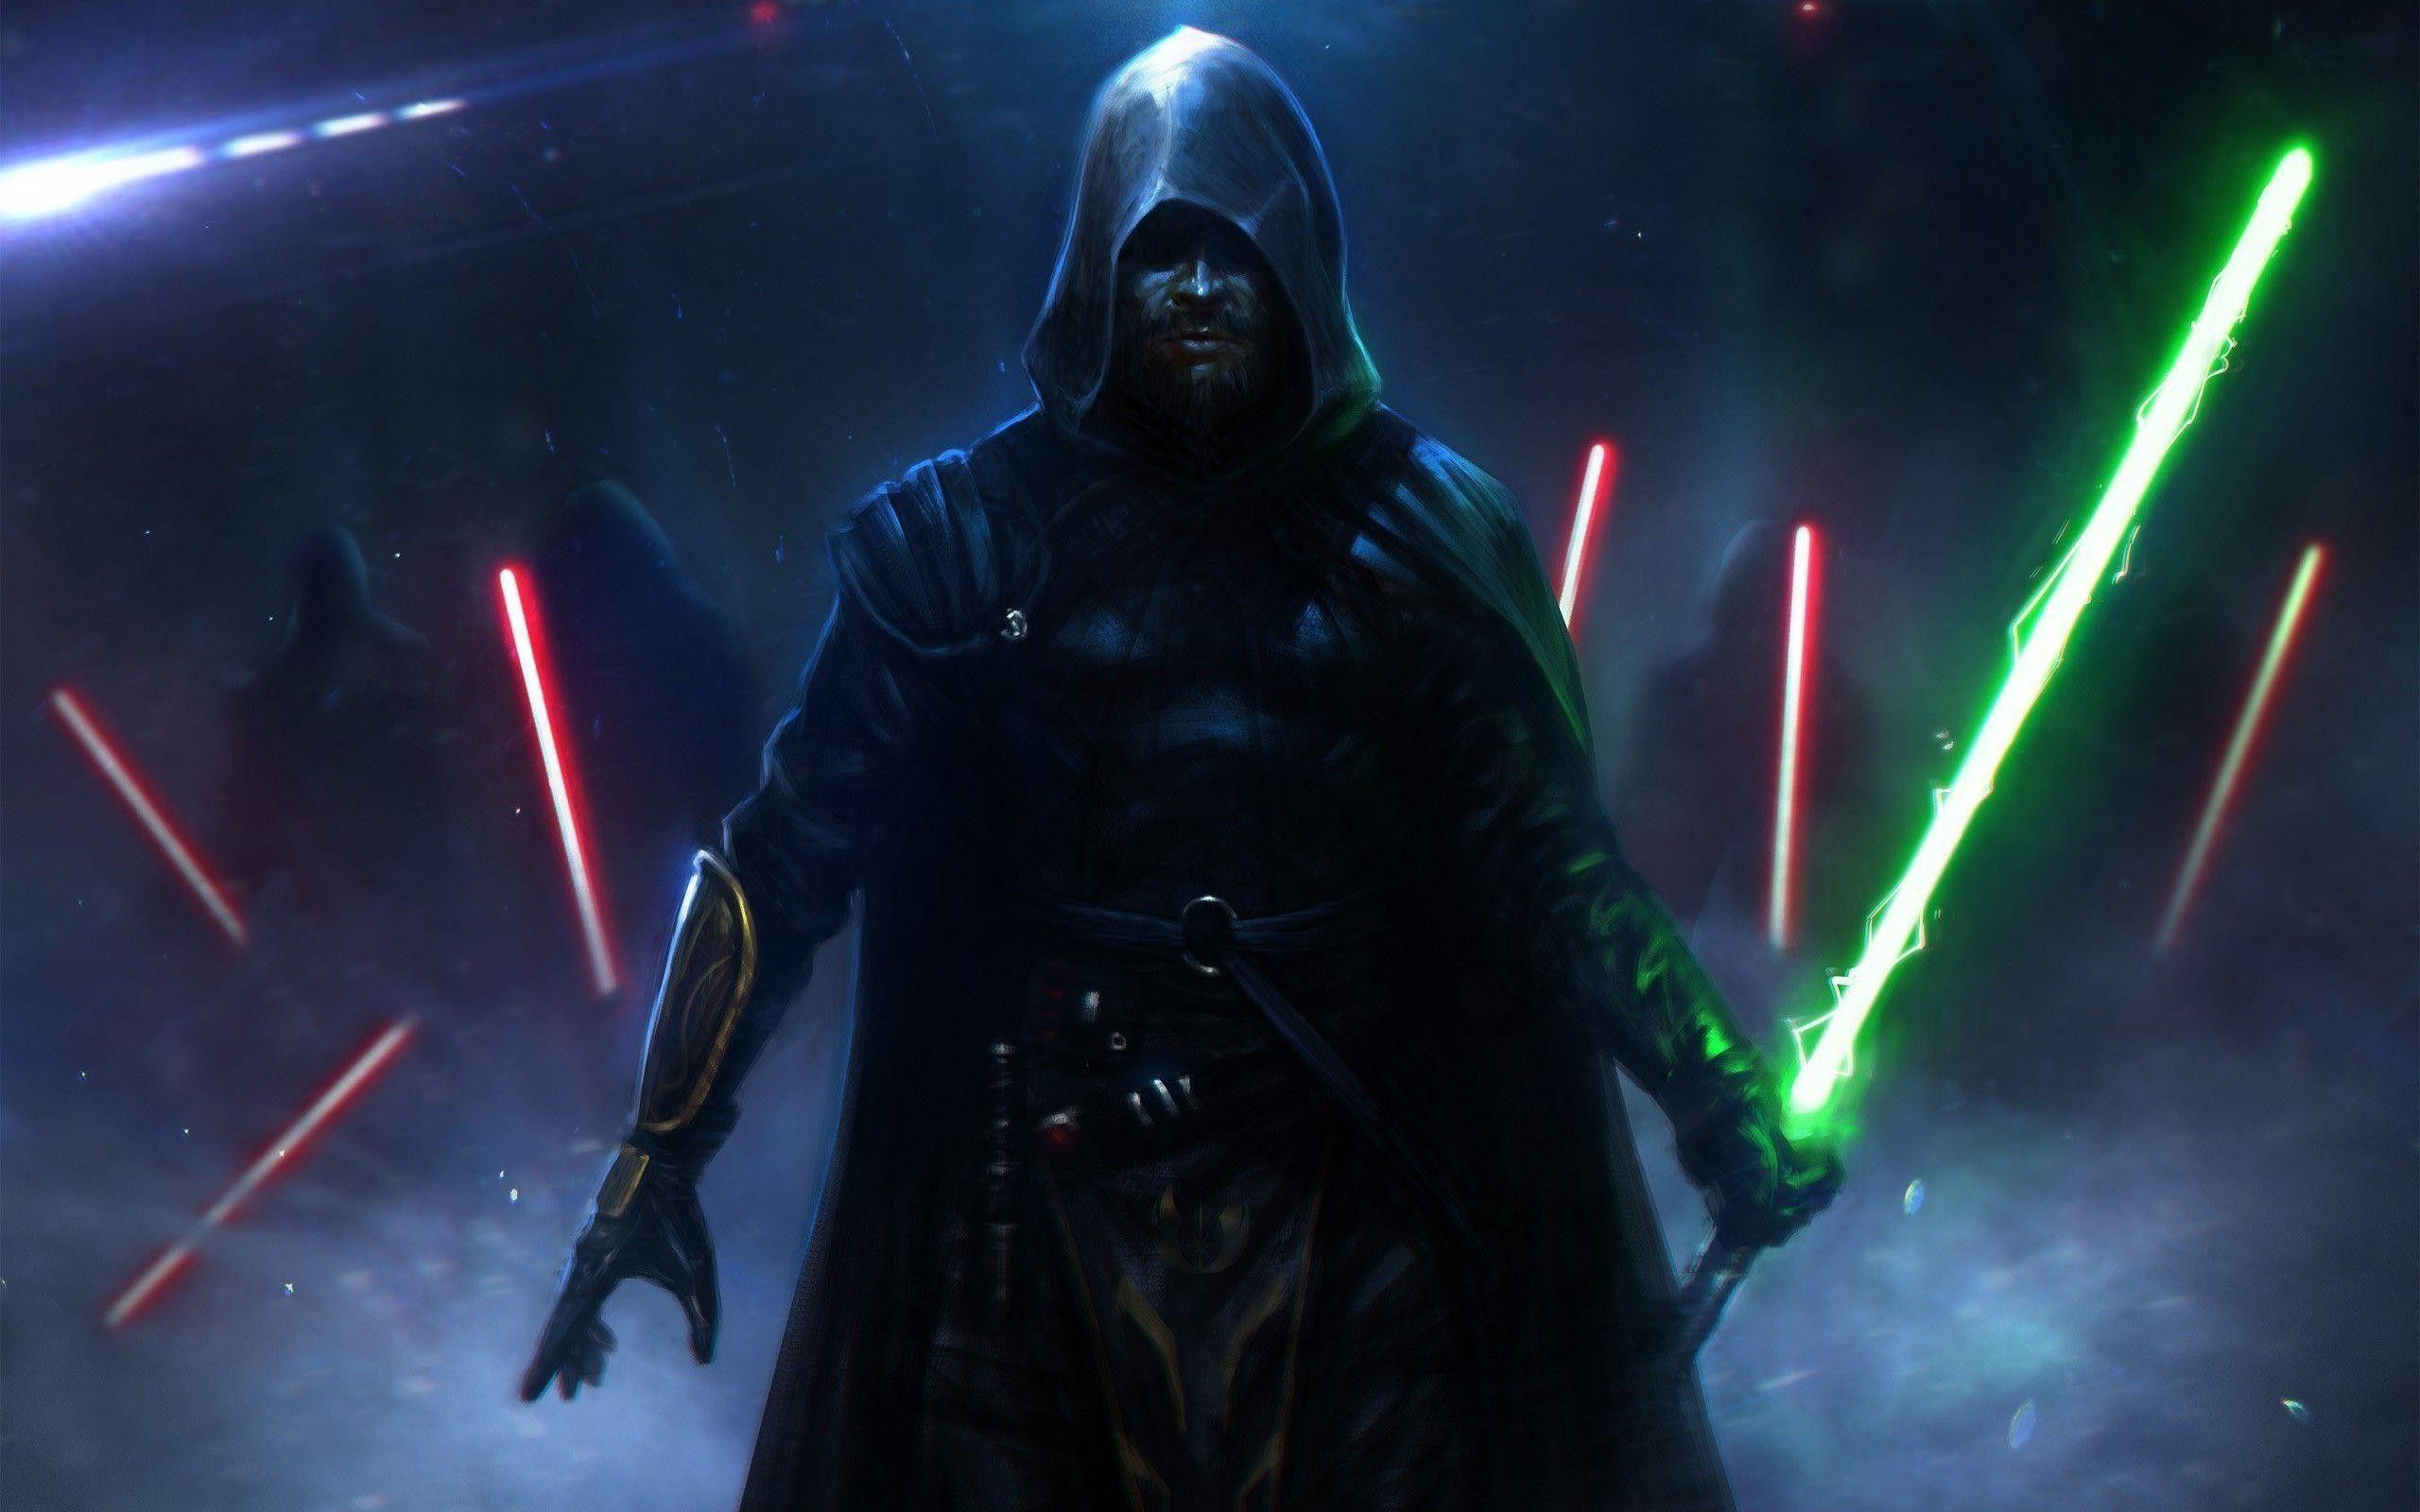 Ultra HD Jedi Wallpapers   Top Ultra HD Jedi Backgrounds 2560x1600